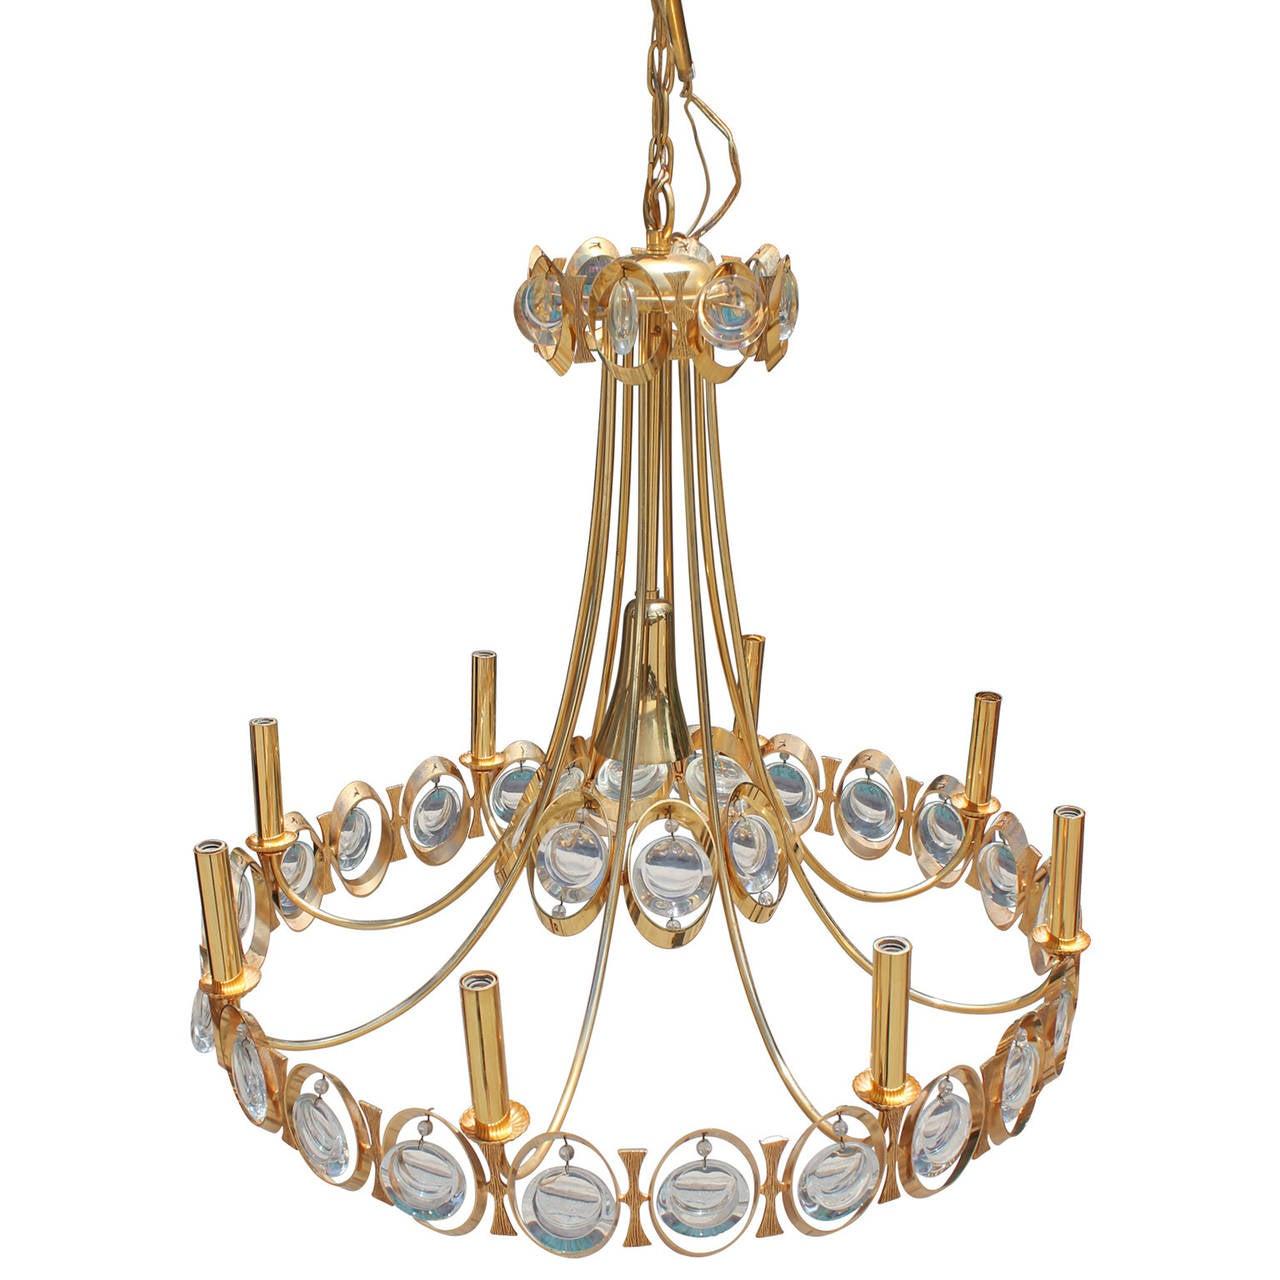 Stunning Gilt Brass Hollywood Regency Chandelier By Palwa